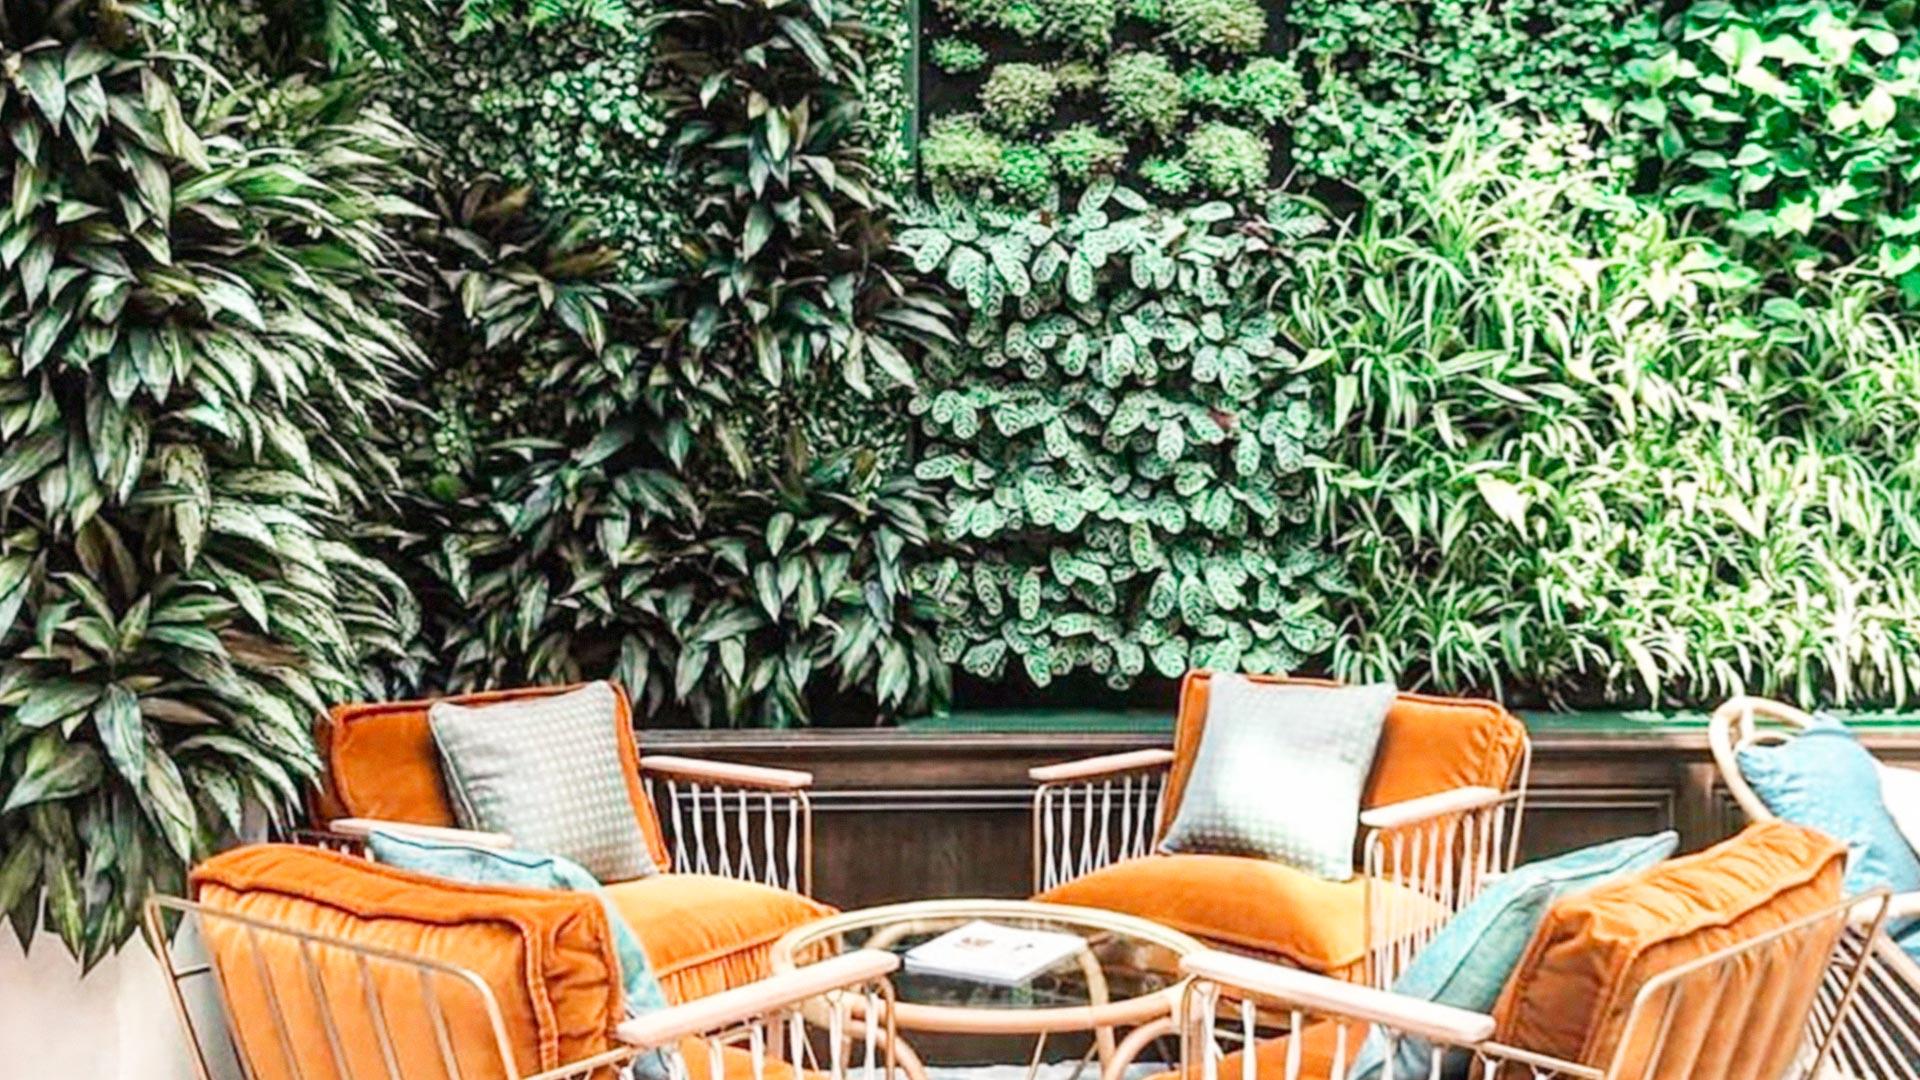 PLANTSCAPING DESIGN